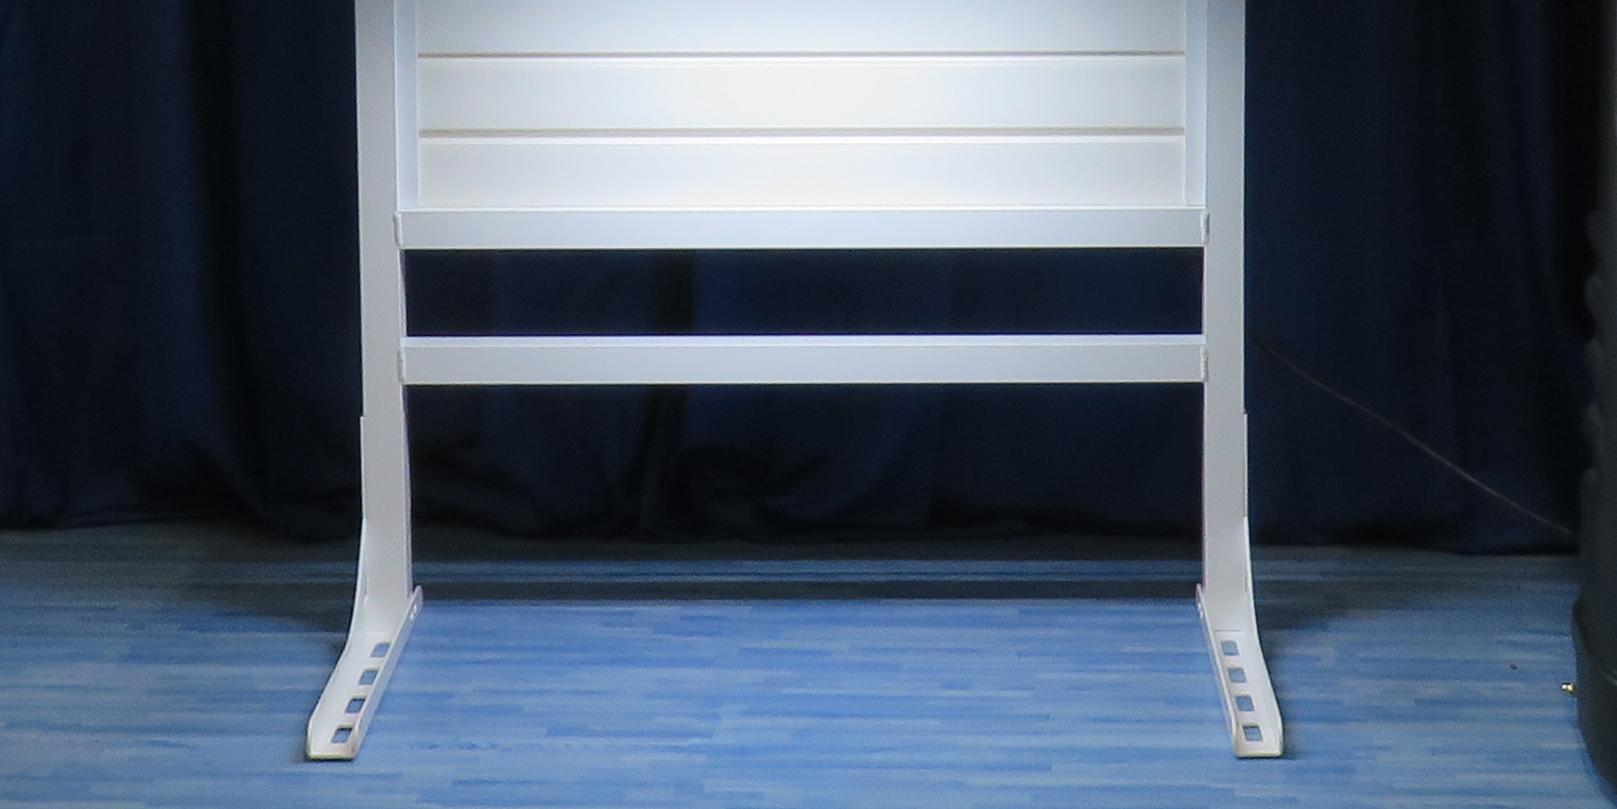 Low Cost Slat Wall Floor Stands   Trade Show Slat Wall Panel Kits